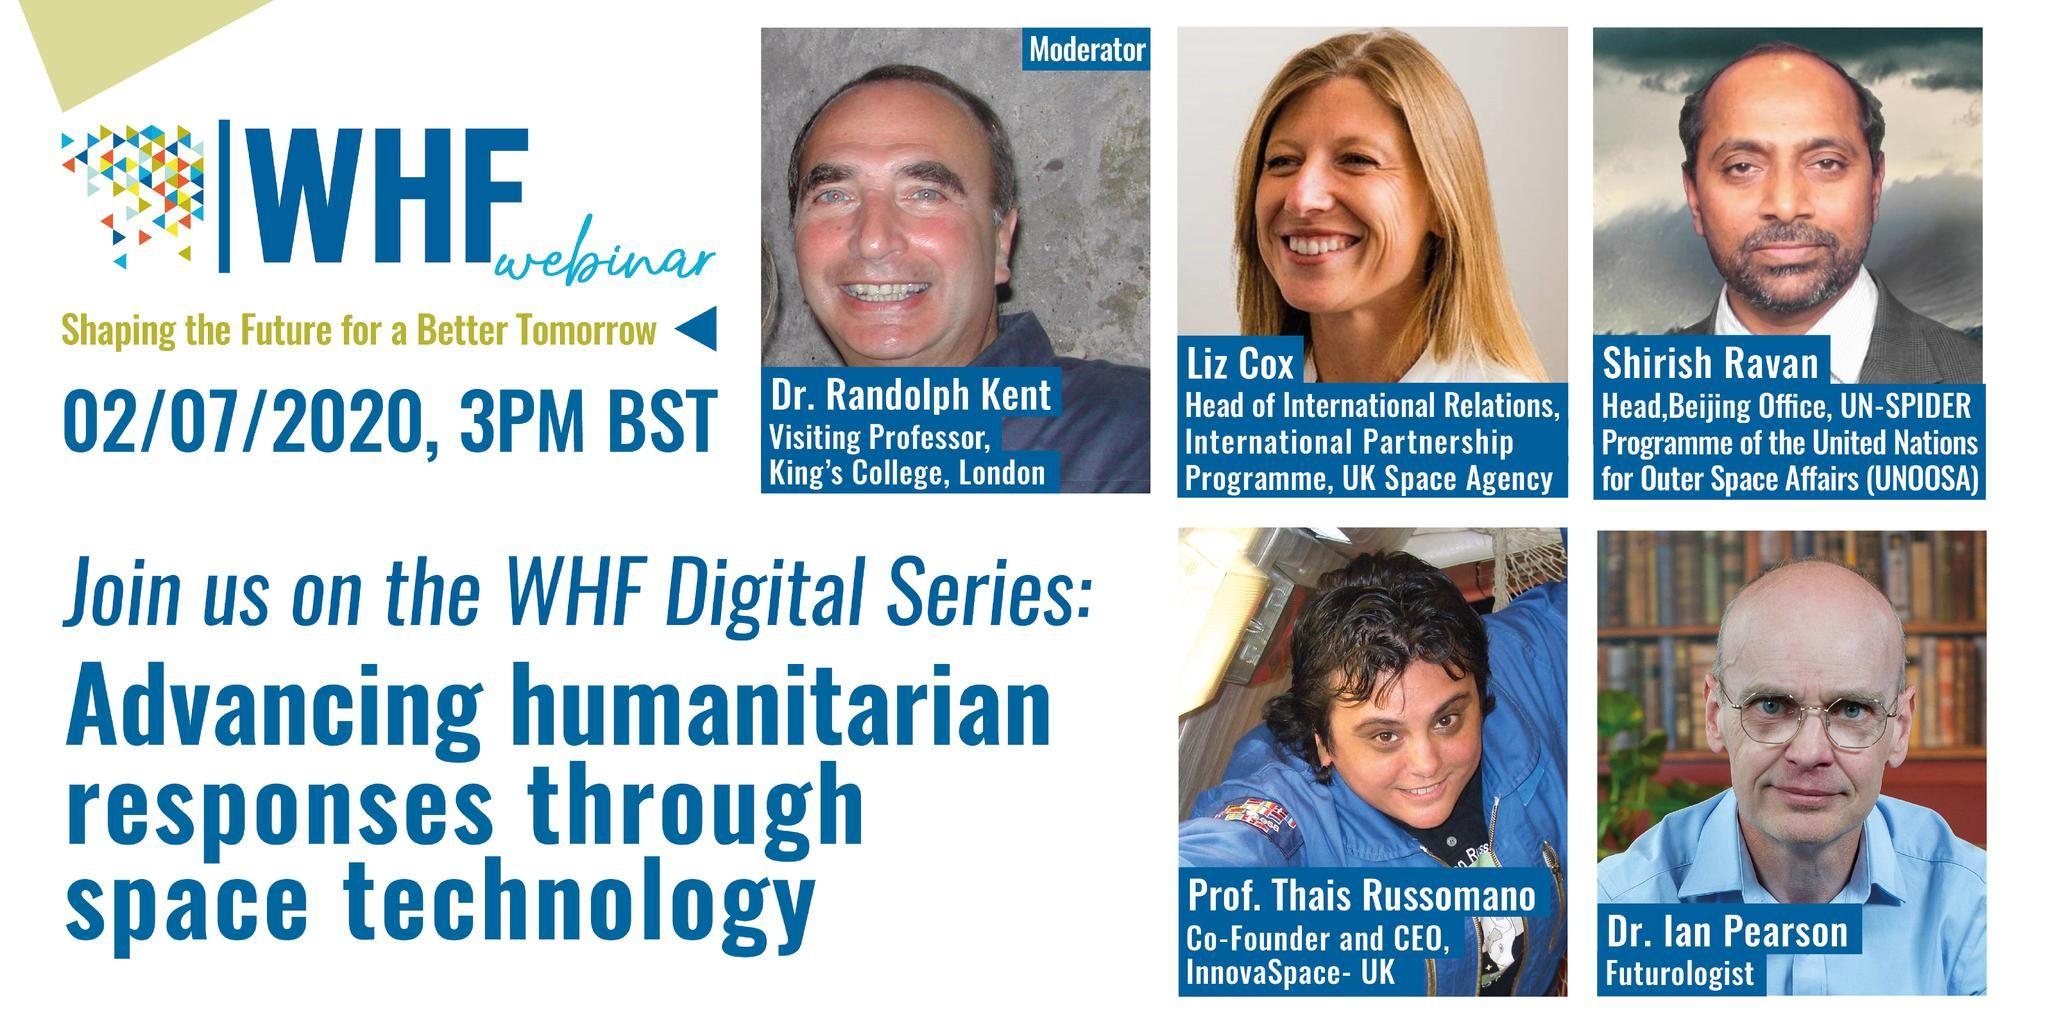 Advancing Humanitarian Responses through Space Technology